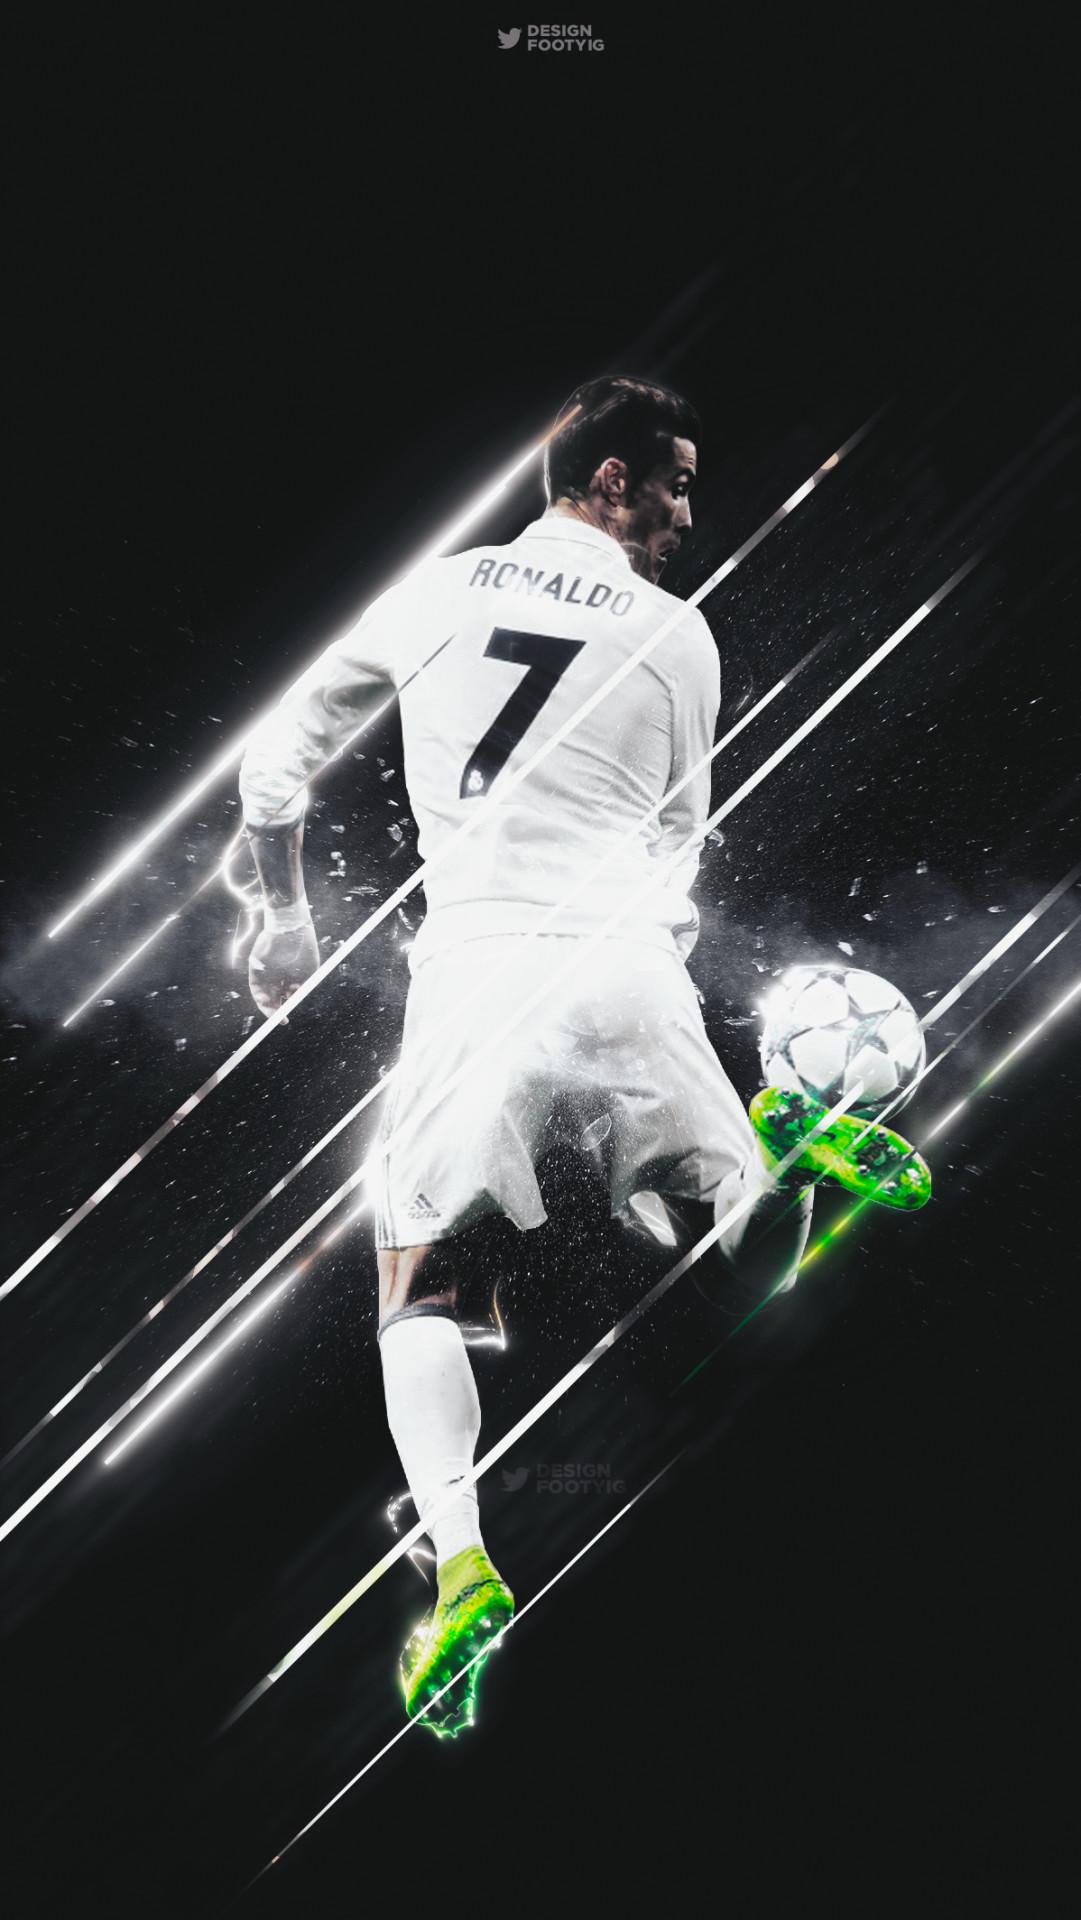 DESIGNDANIEL Cristiano Ronaldo edit / Phone wallpaper by Design Daniel on  tumblr. Real Madrid,